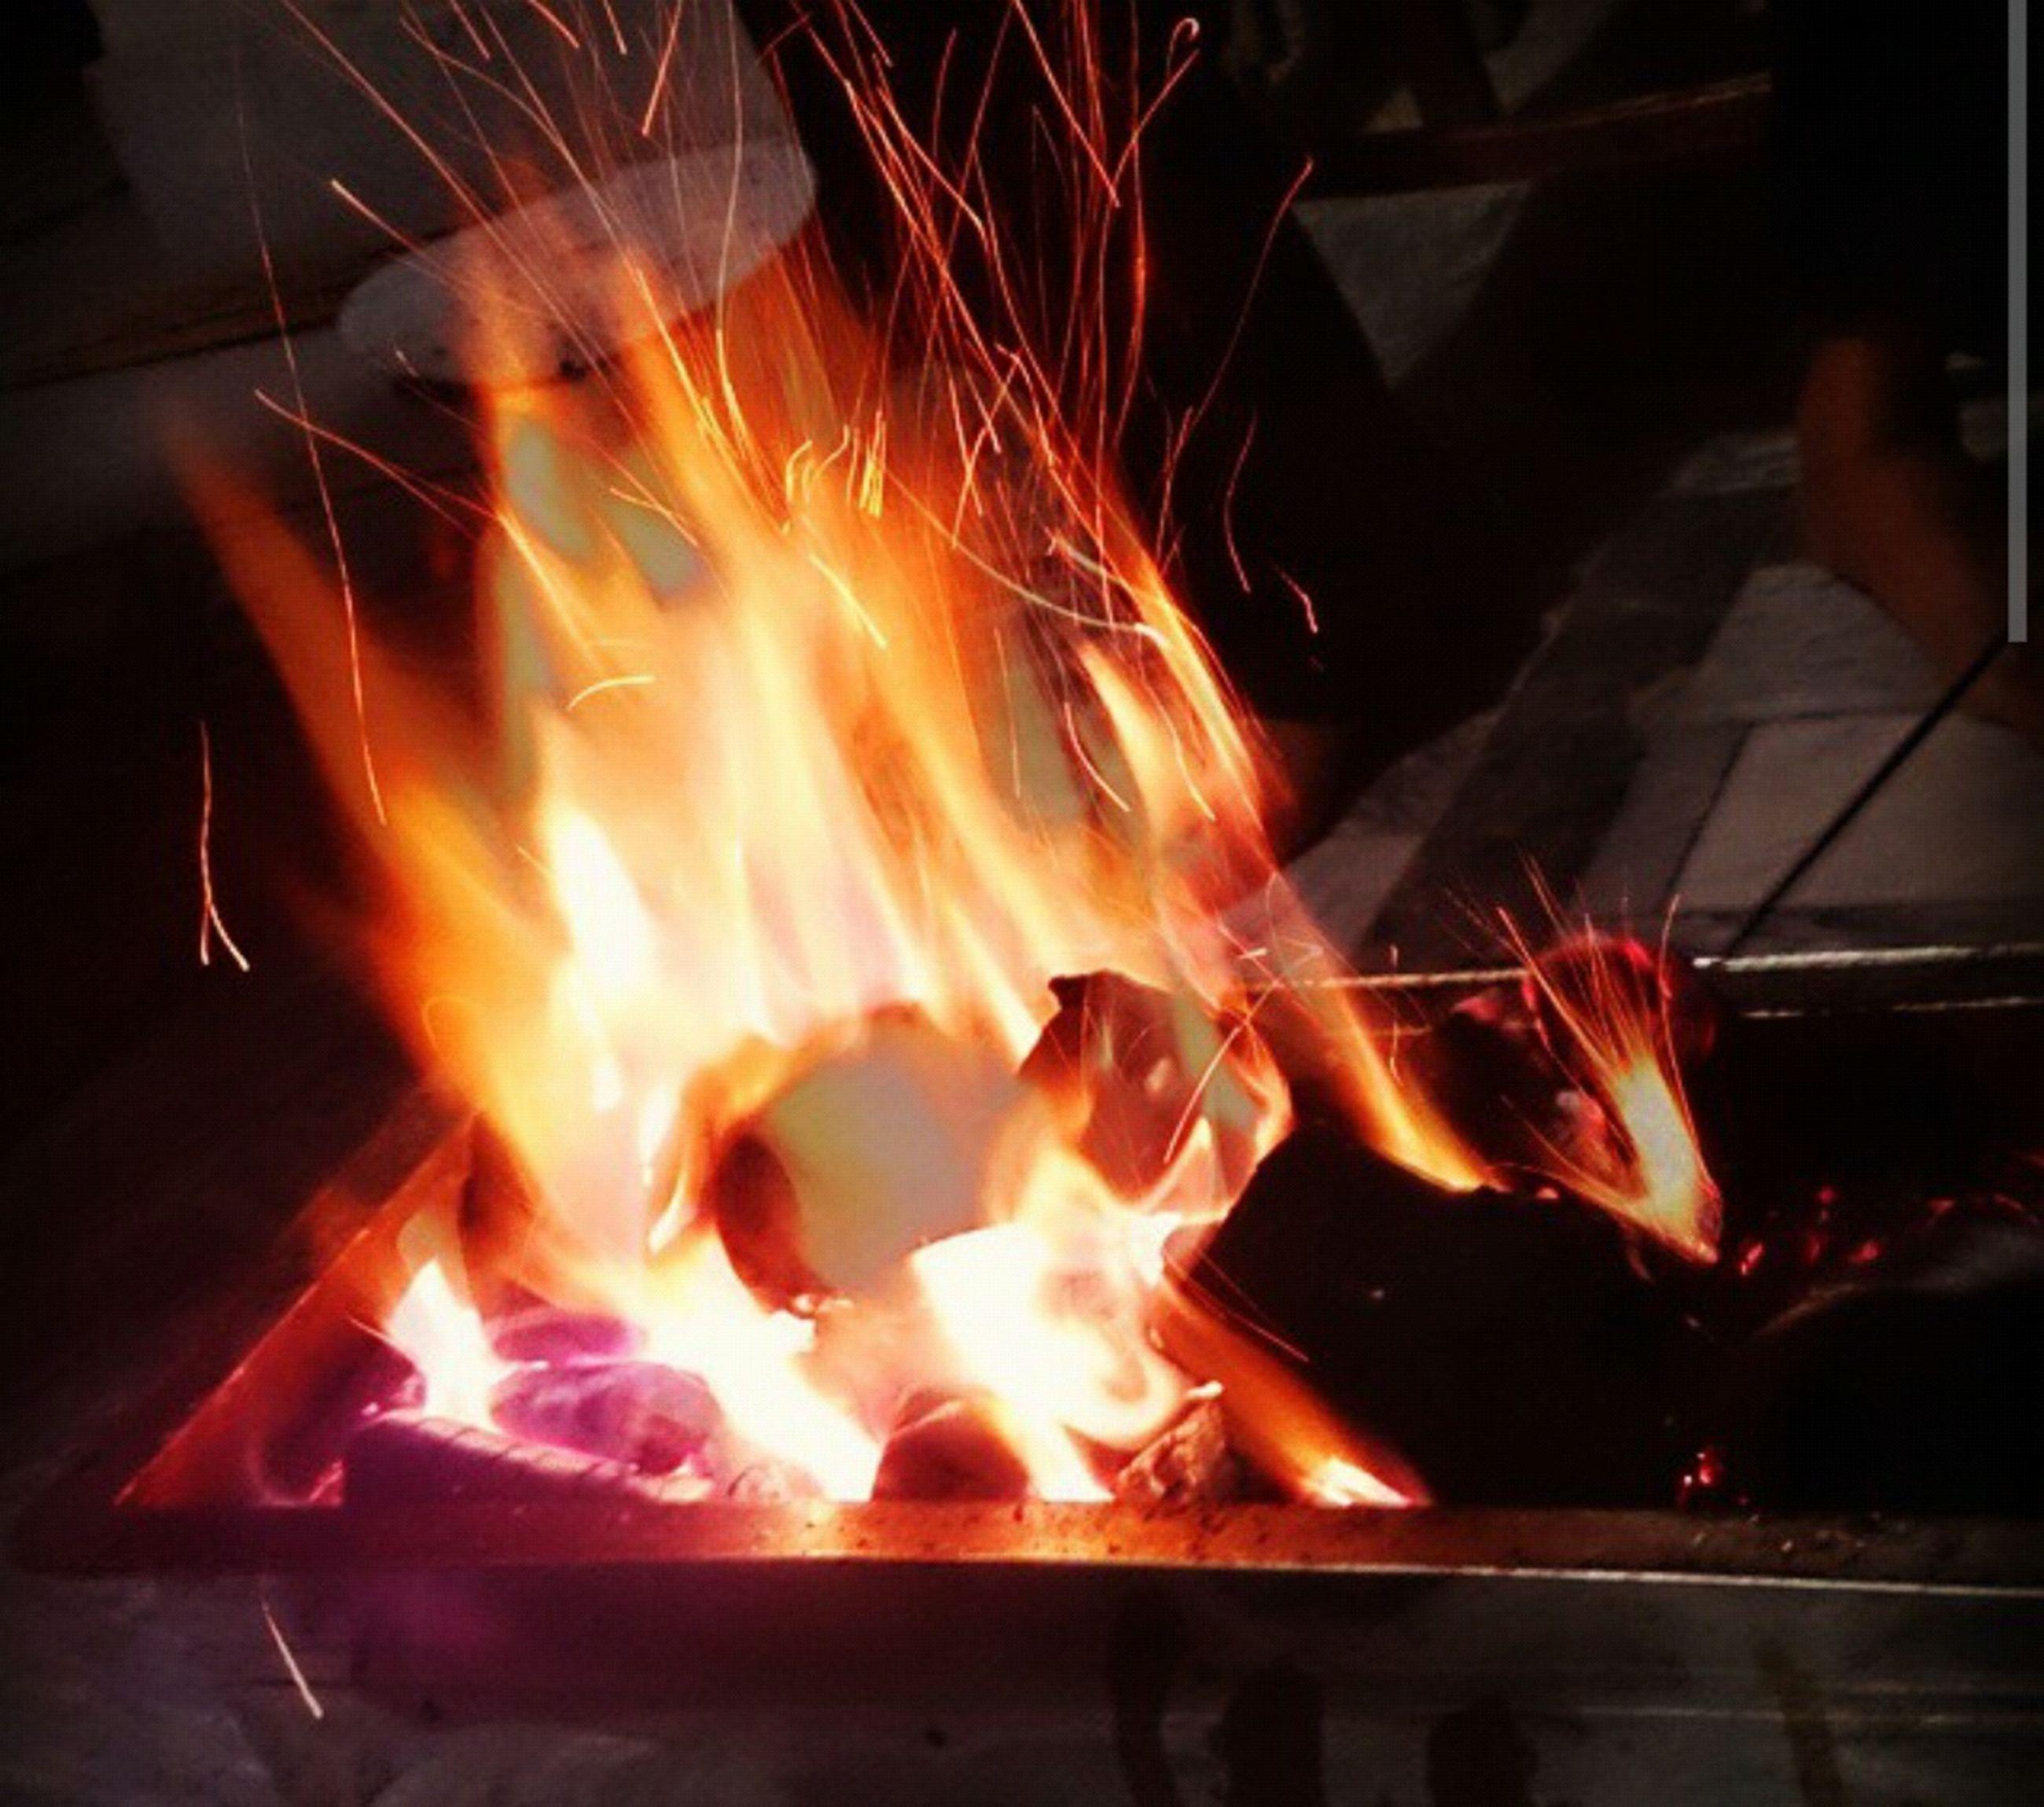 fire - natural phenomenon, flame, burning, night, heat - temperature, illuminated, glowing, motion, bonfire, fire, long exposure, indoors, campfire, light - natural phenomenon, firewood, blurred motion, arts culture and entertainment, celebration, heat, dark